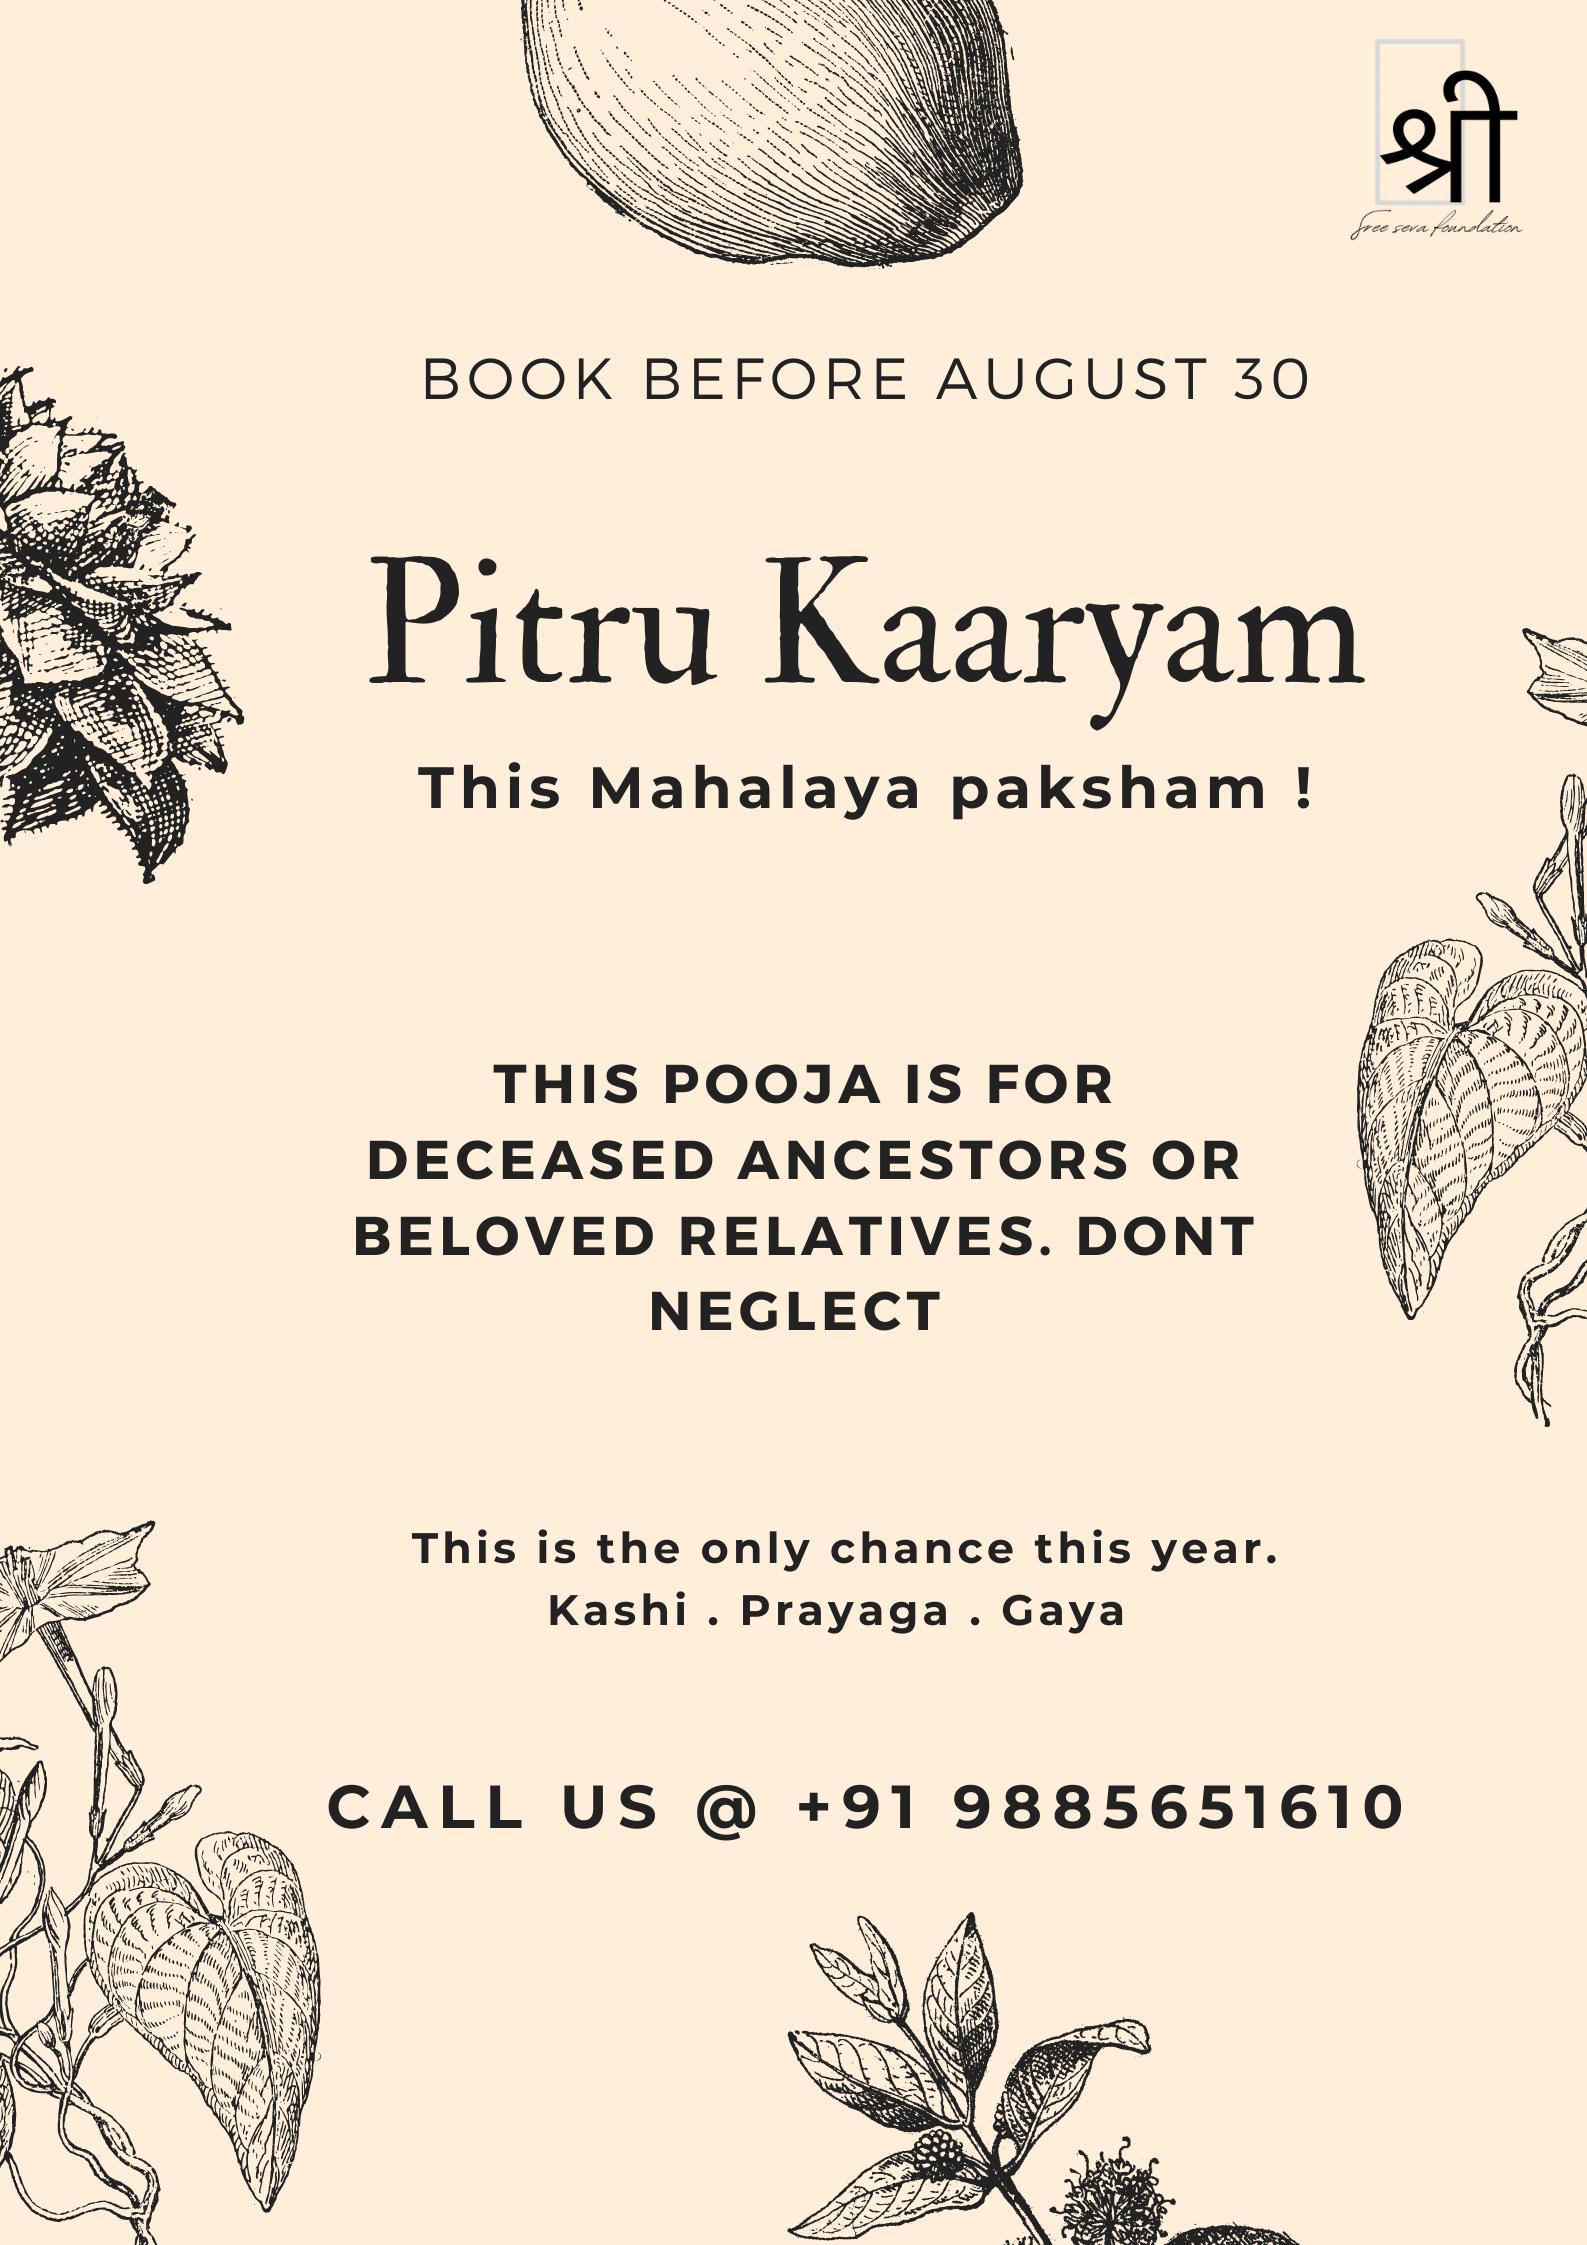 PitruKaaryam 2